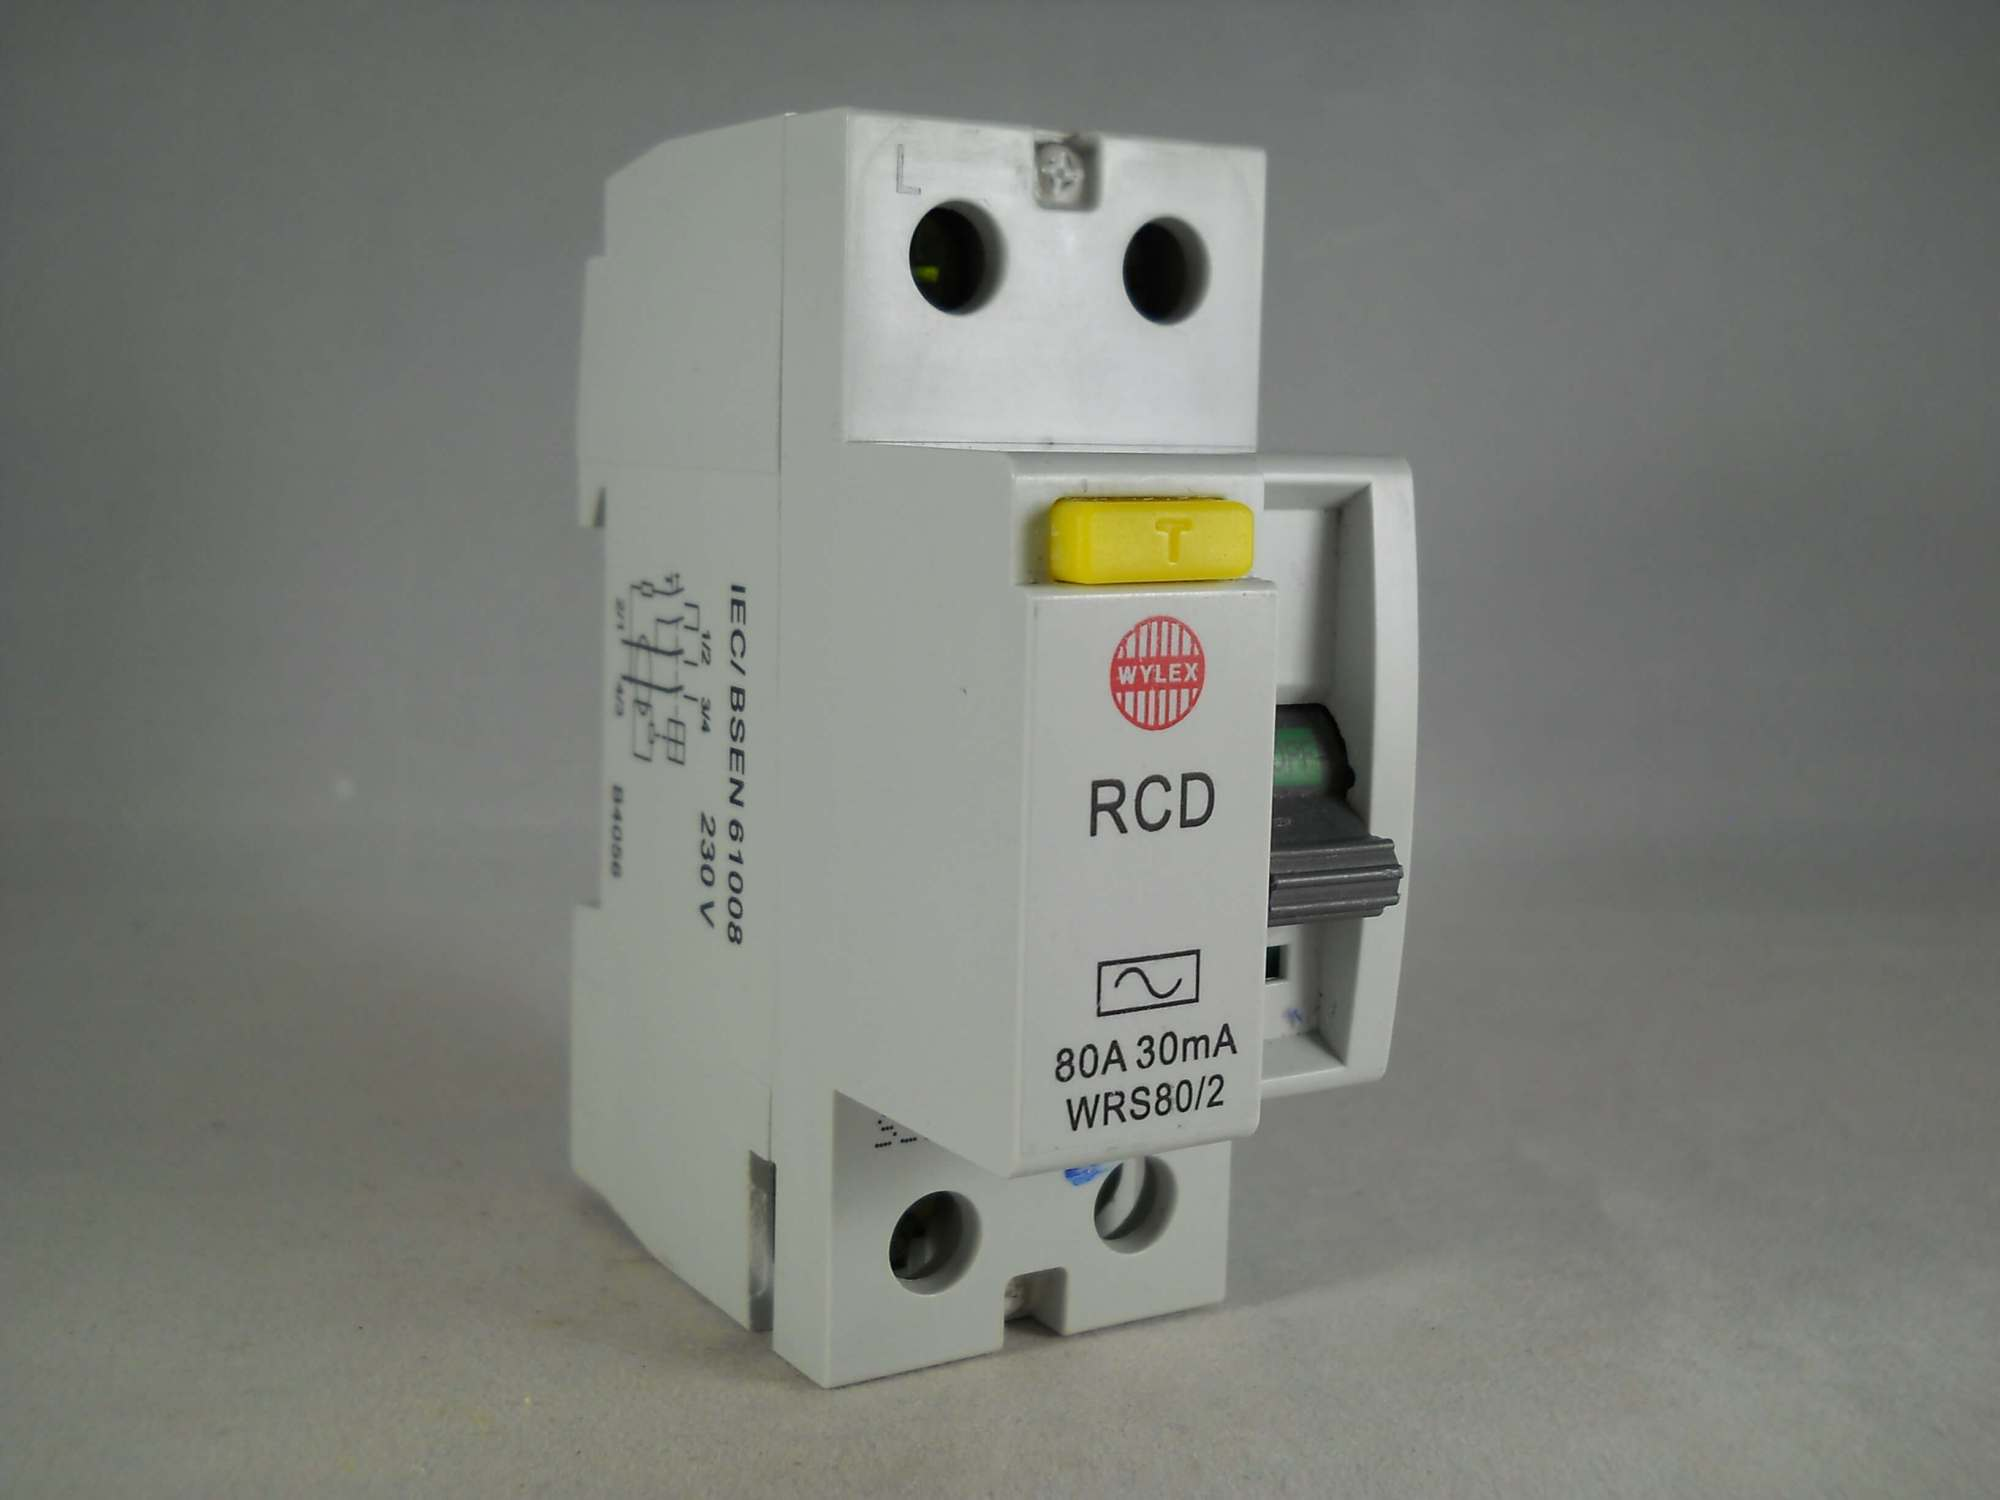 hight resolution of wylex fuse box wiring wiring diagram centre wylex fuse box rcd